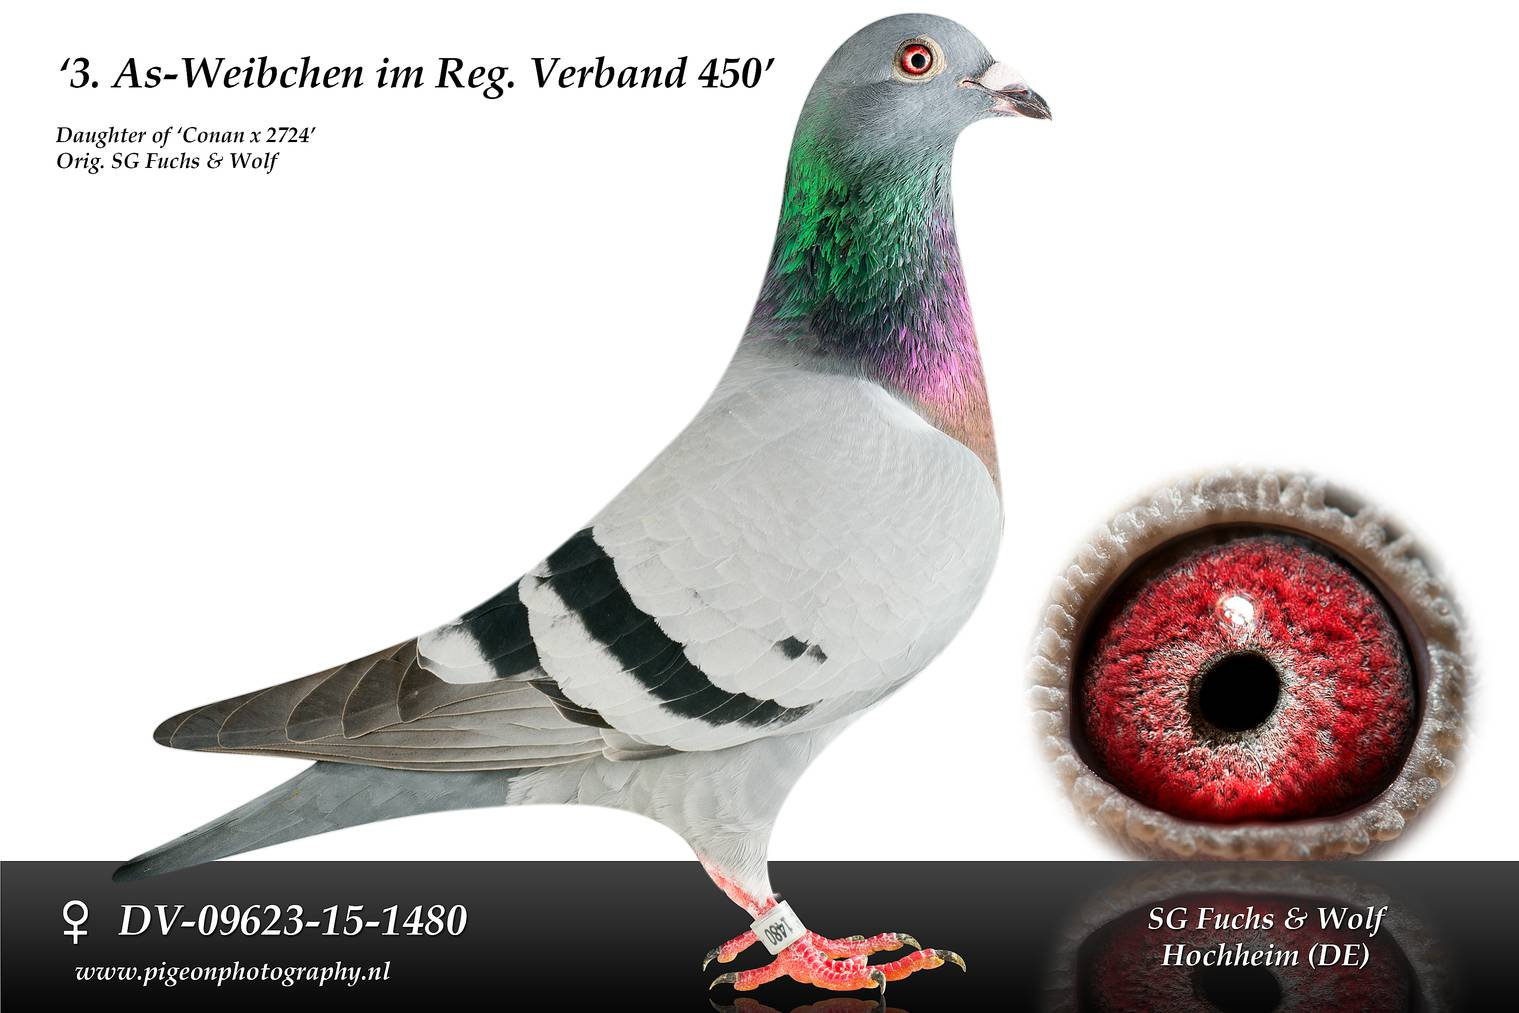 DV 09623 15 1480